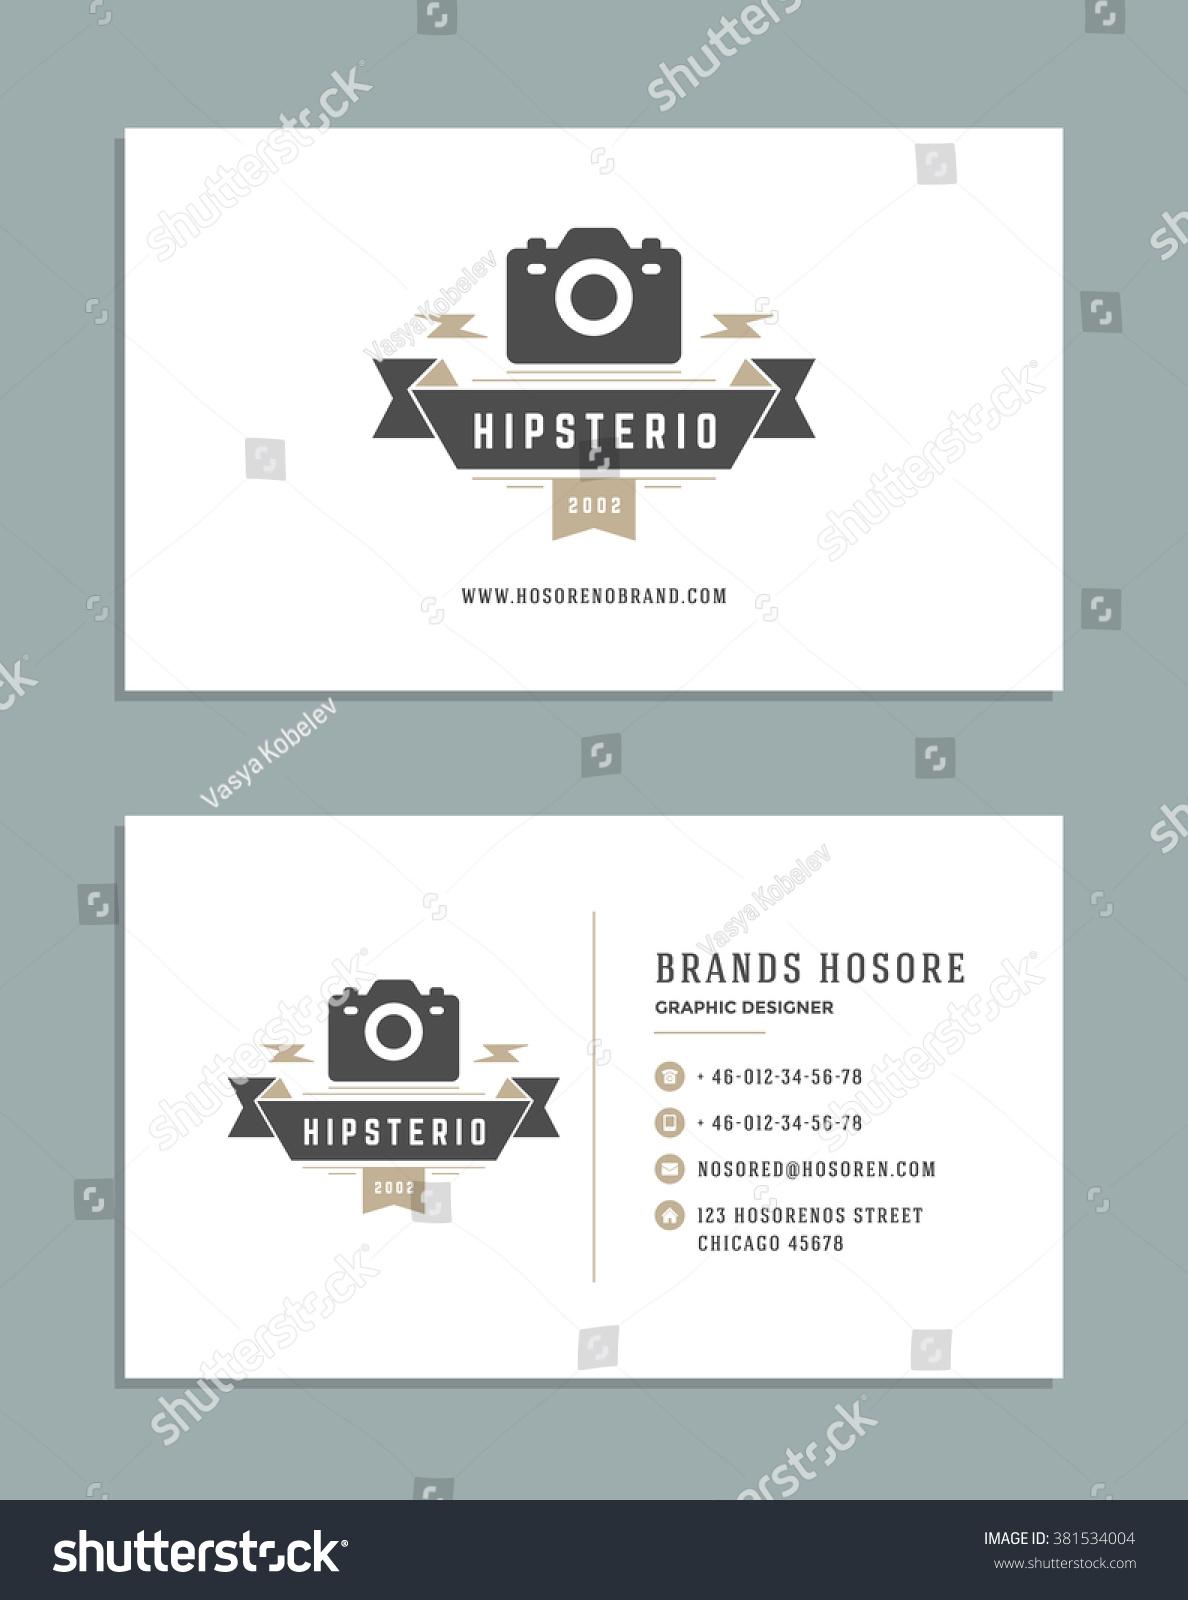 business card design photographer logo template a¹€a¸§a¸a¹€a¸•a¸a¸a¹Œa¸aa¸•a¹‡a¸a¸